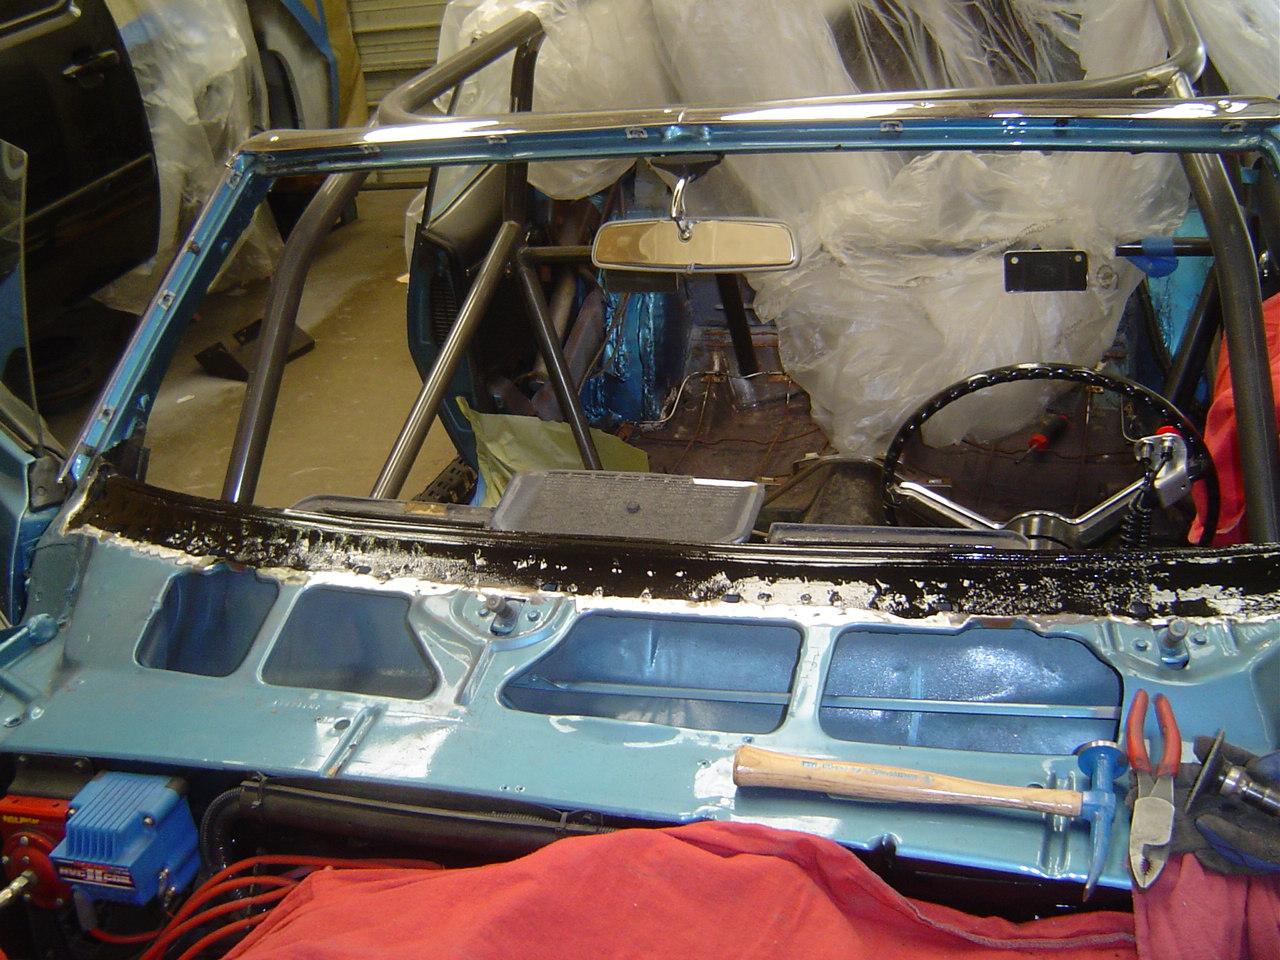 100 camaro window repair guide 1994 2002 chevy for 2000 camaro window motor replacement